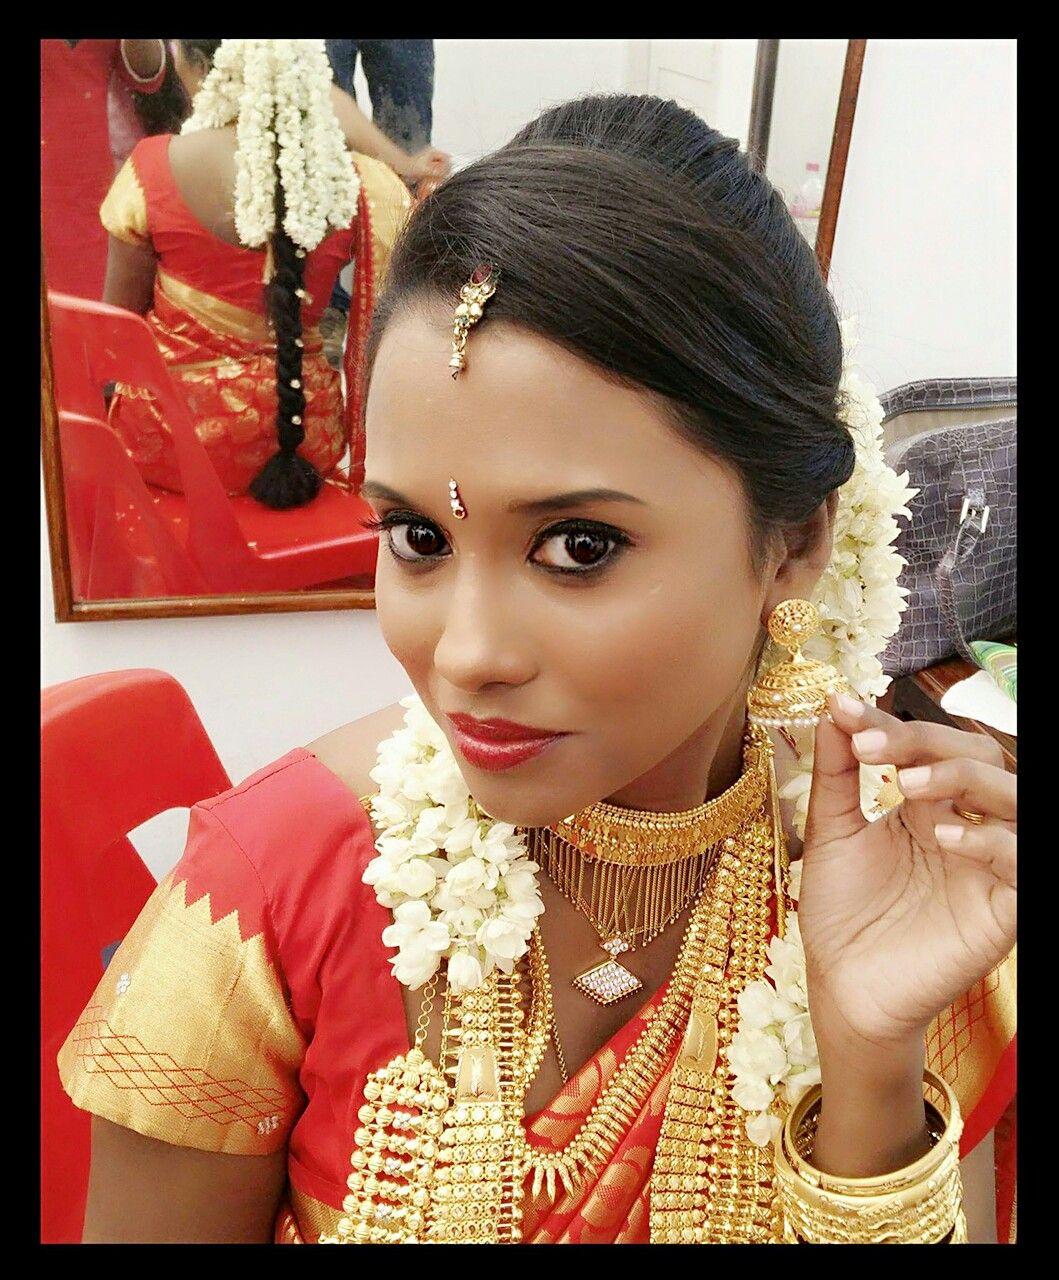 Wedding Hairstyle Kerala: #Indian Wedding #kerala Wedding #kerala Bride #wedding